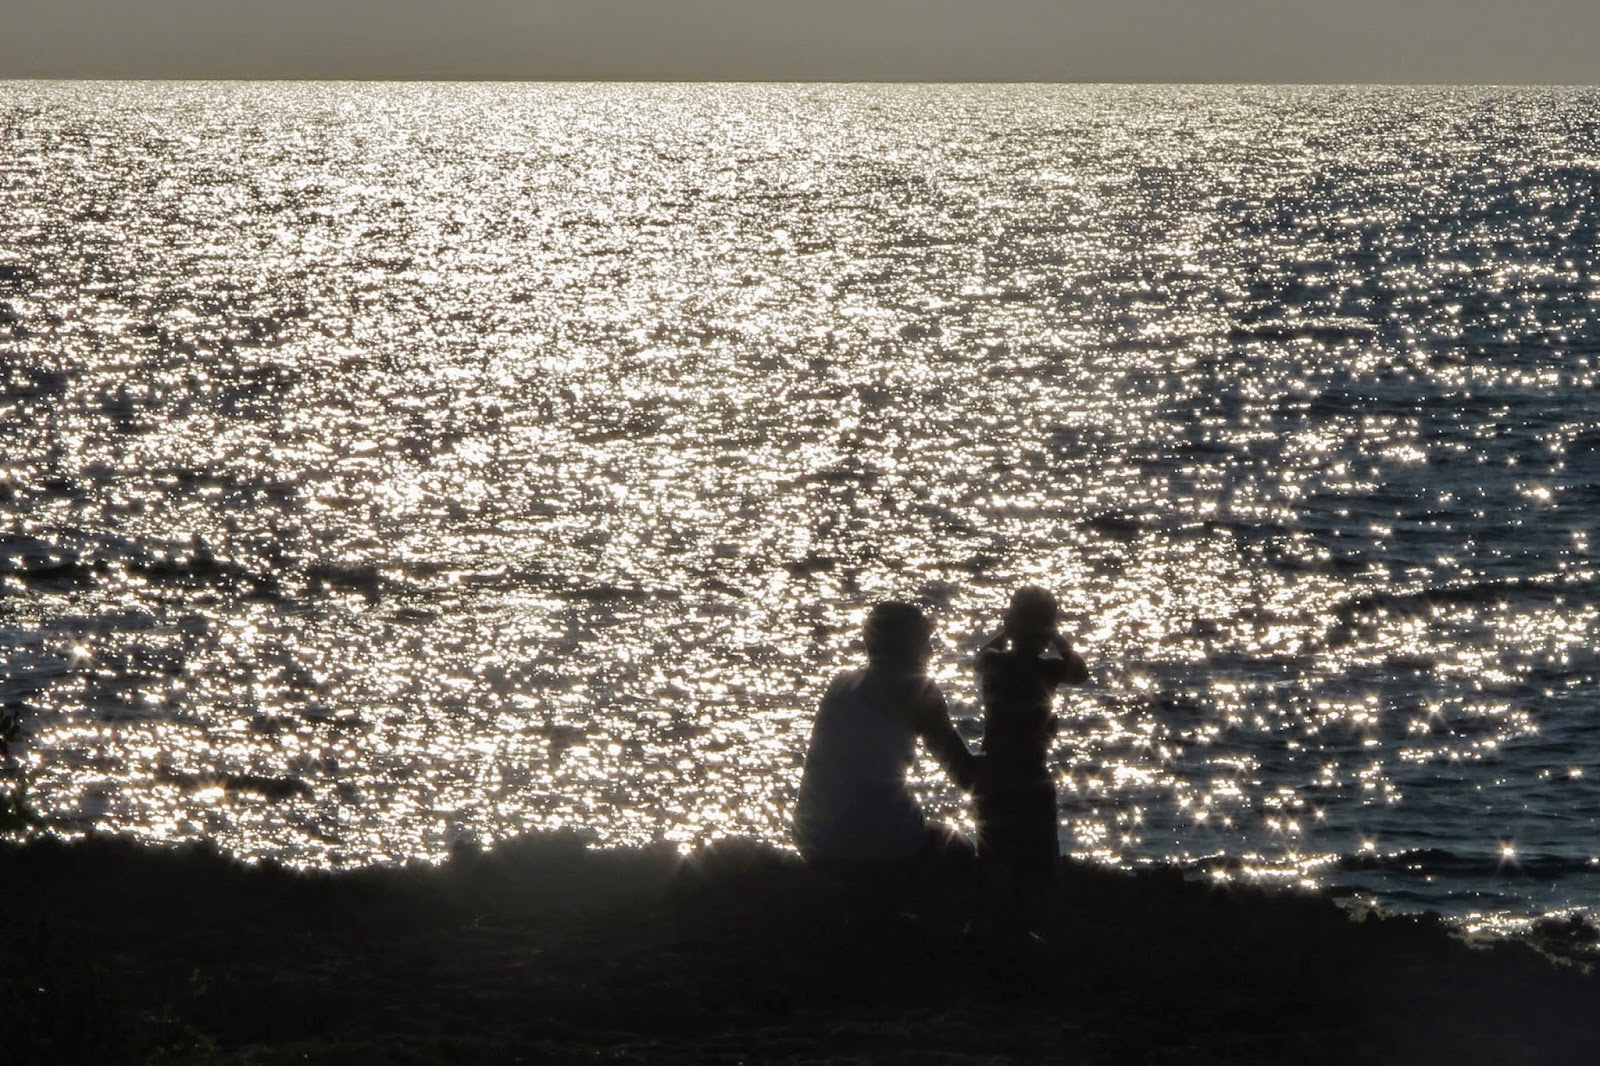 Fim de tarde no Mar do Caribe de Cuba, na Península Áncon.